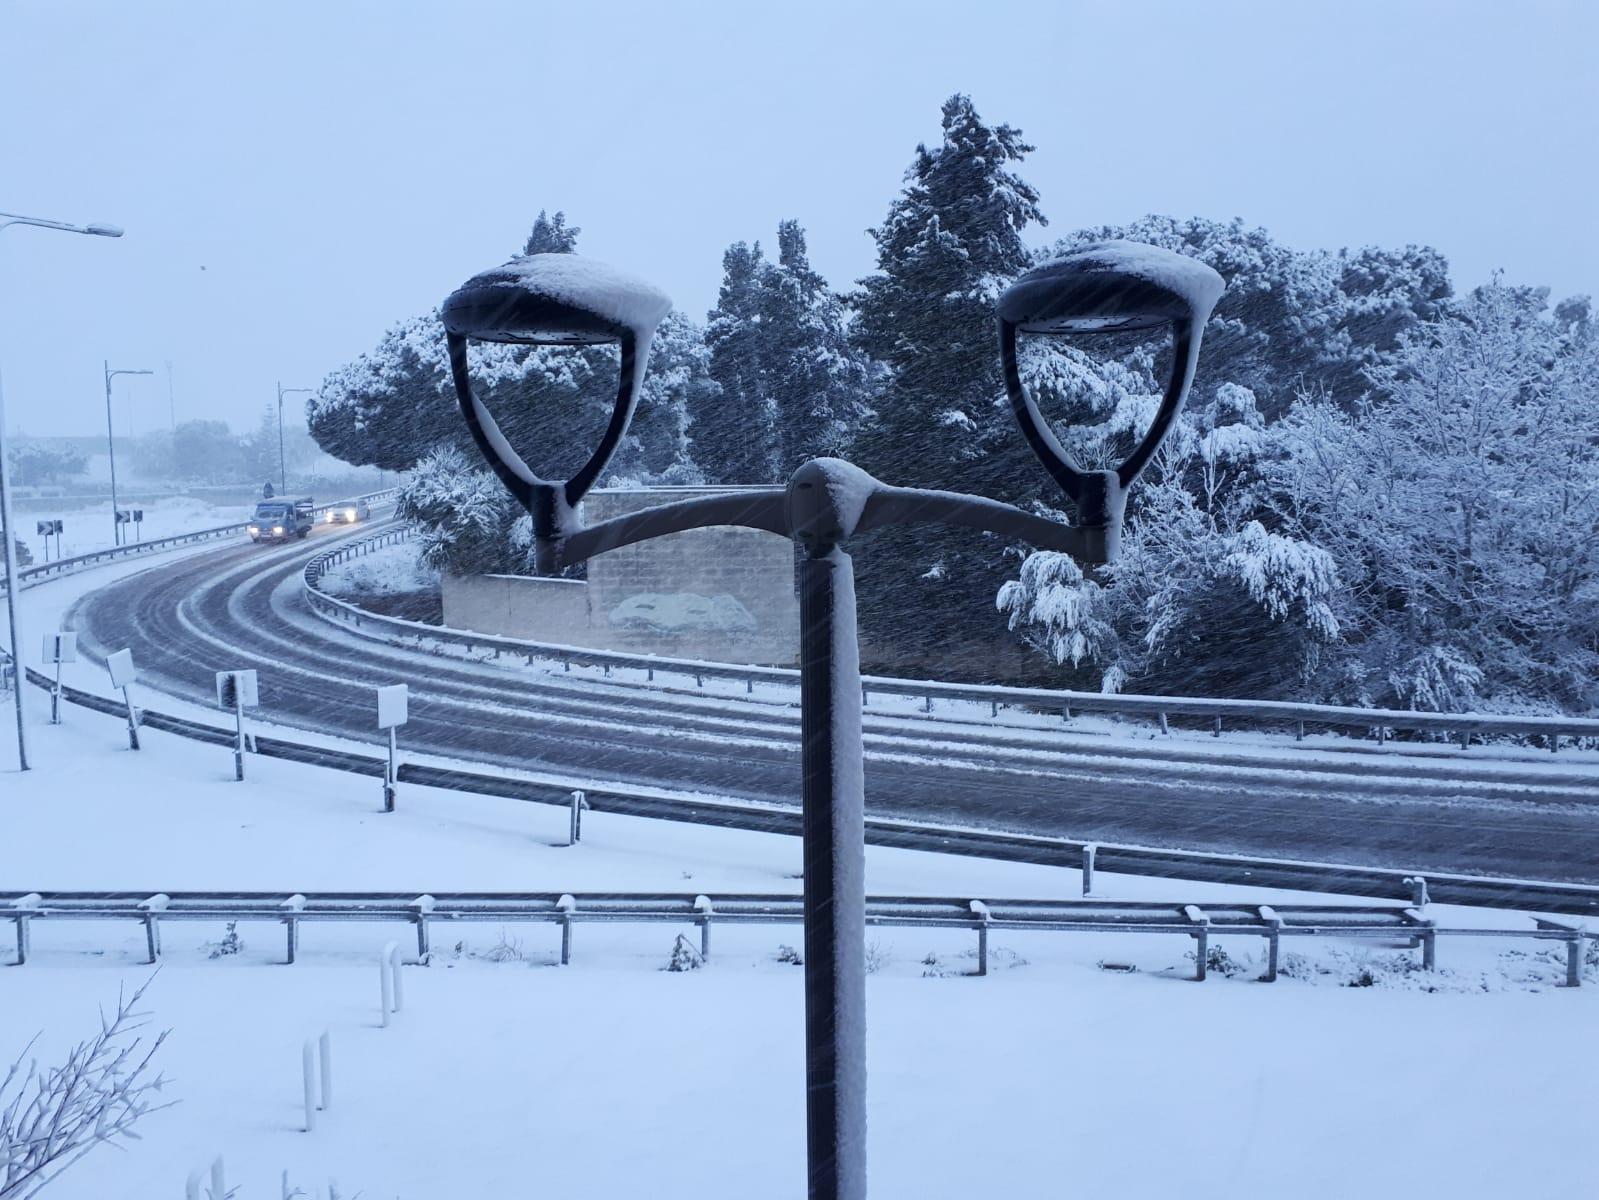 Snowcasting BR - LE - TA 4 Gennaio 2019-7b0ea9db-6509-4e6a-83d8-ee78a782fe34.jpg